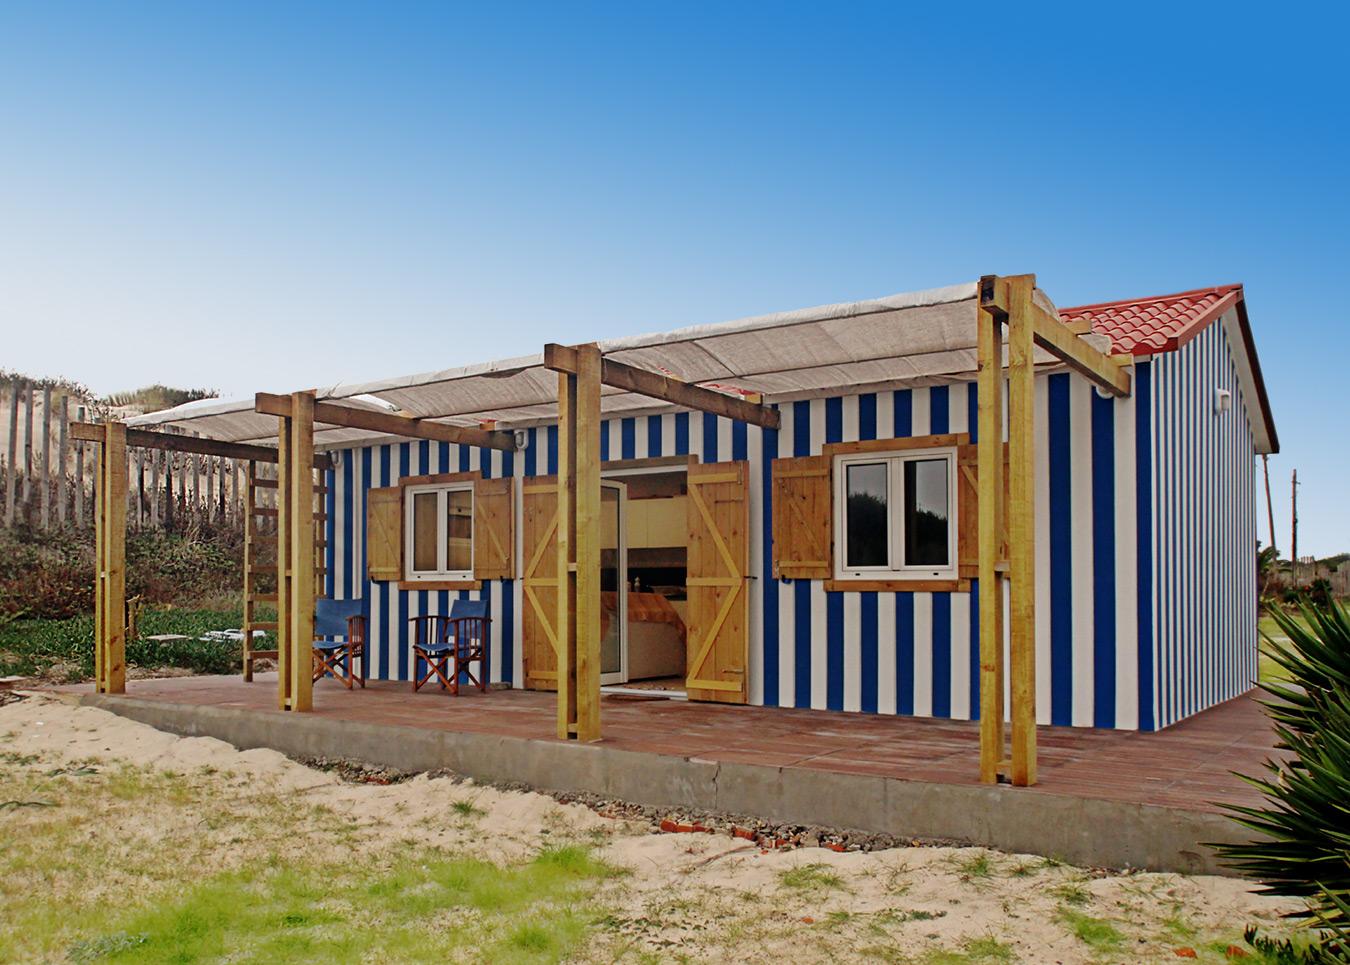 casa da Barra - Restauro - Interiores e exterior